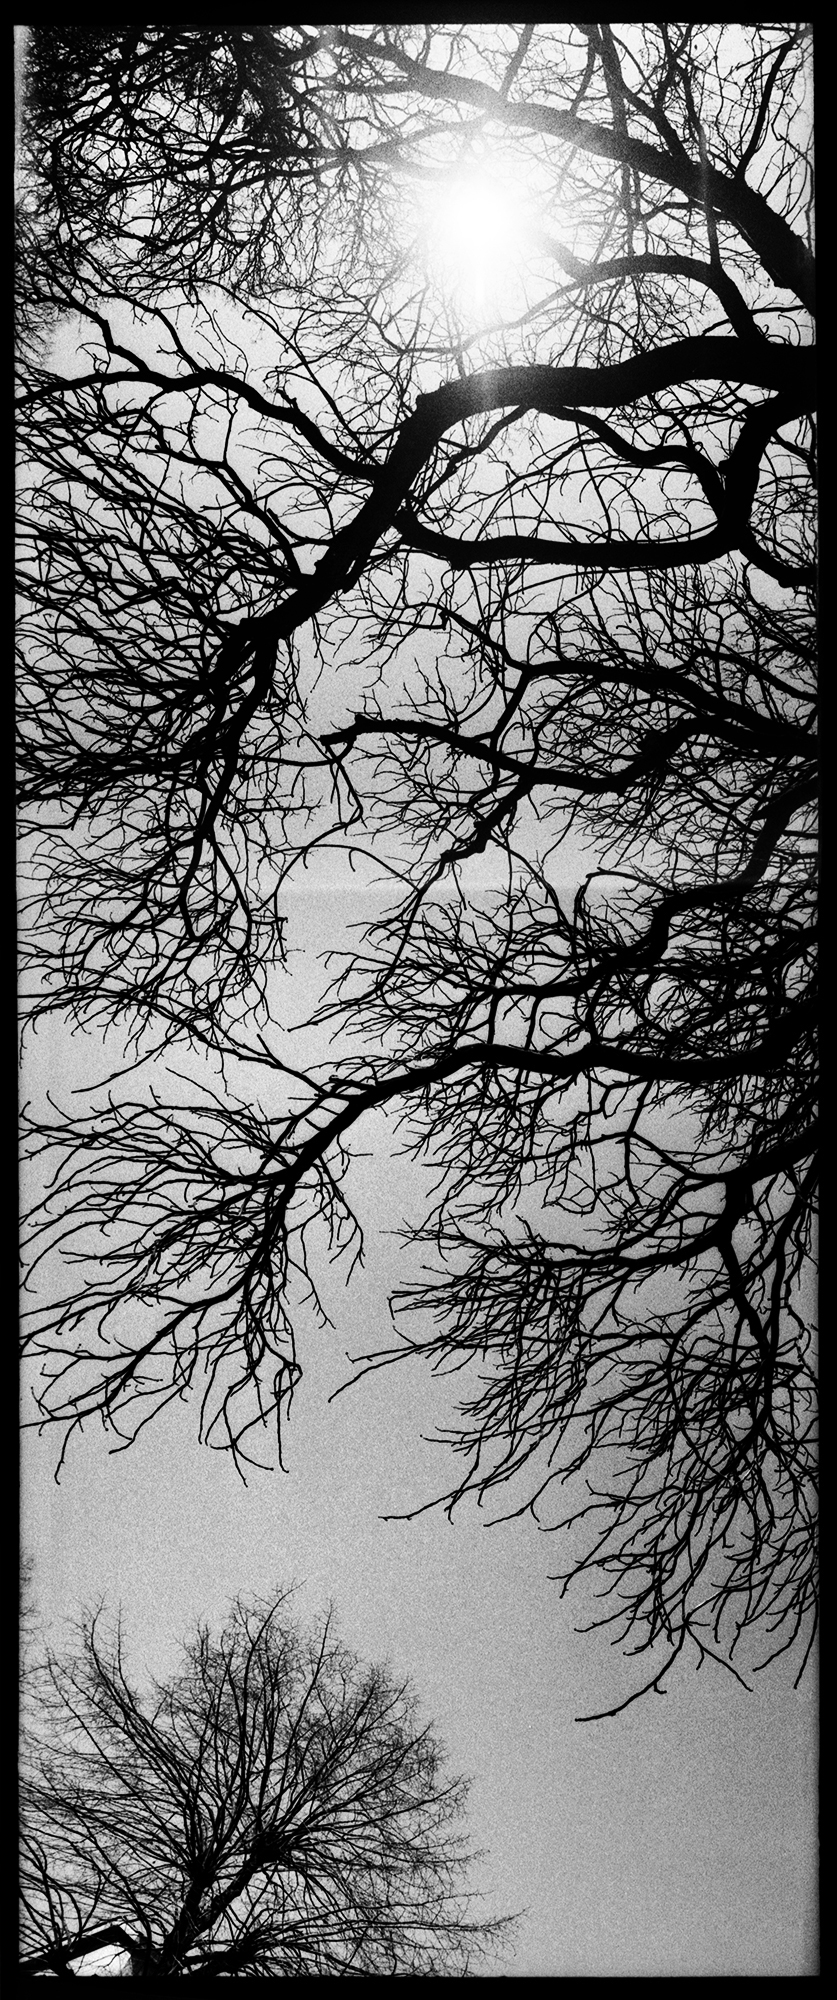 Trees, Plants, Flowers... by Laurent Orseau #141